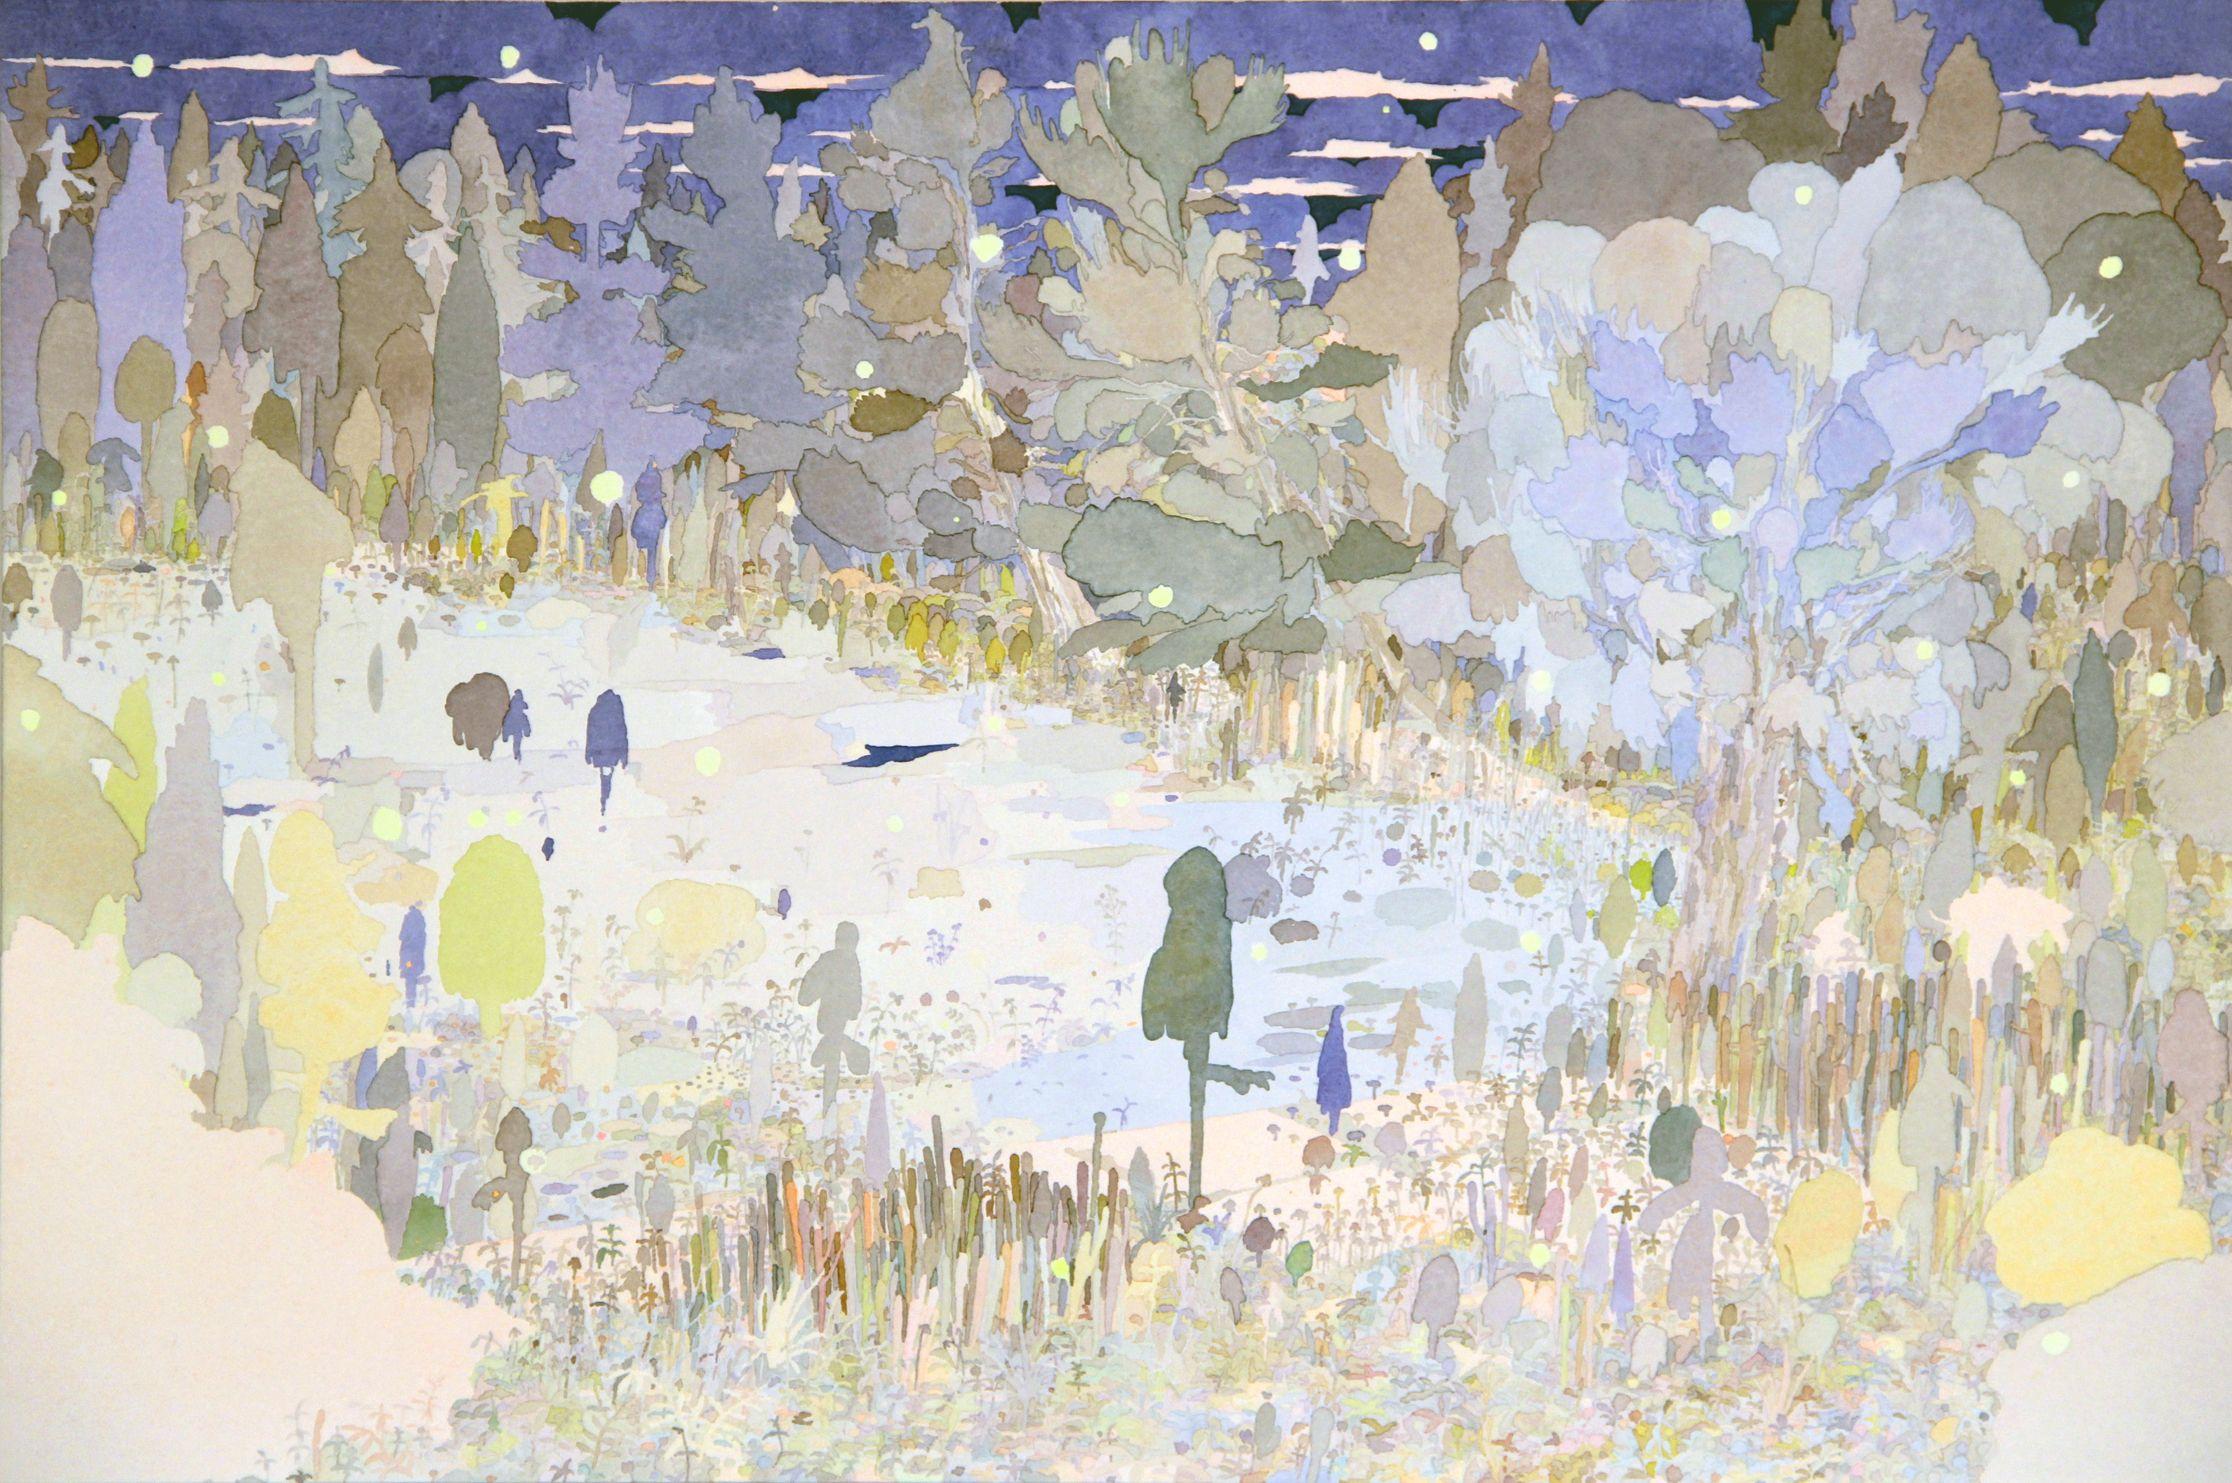 lost-woods2-edit1small.jpg (2232×1483)